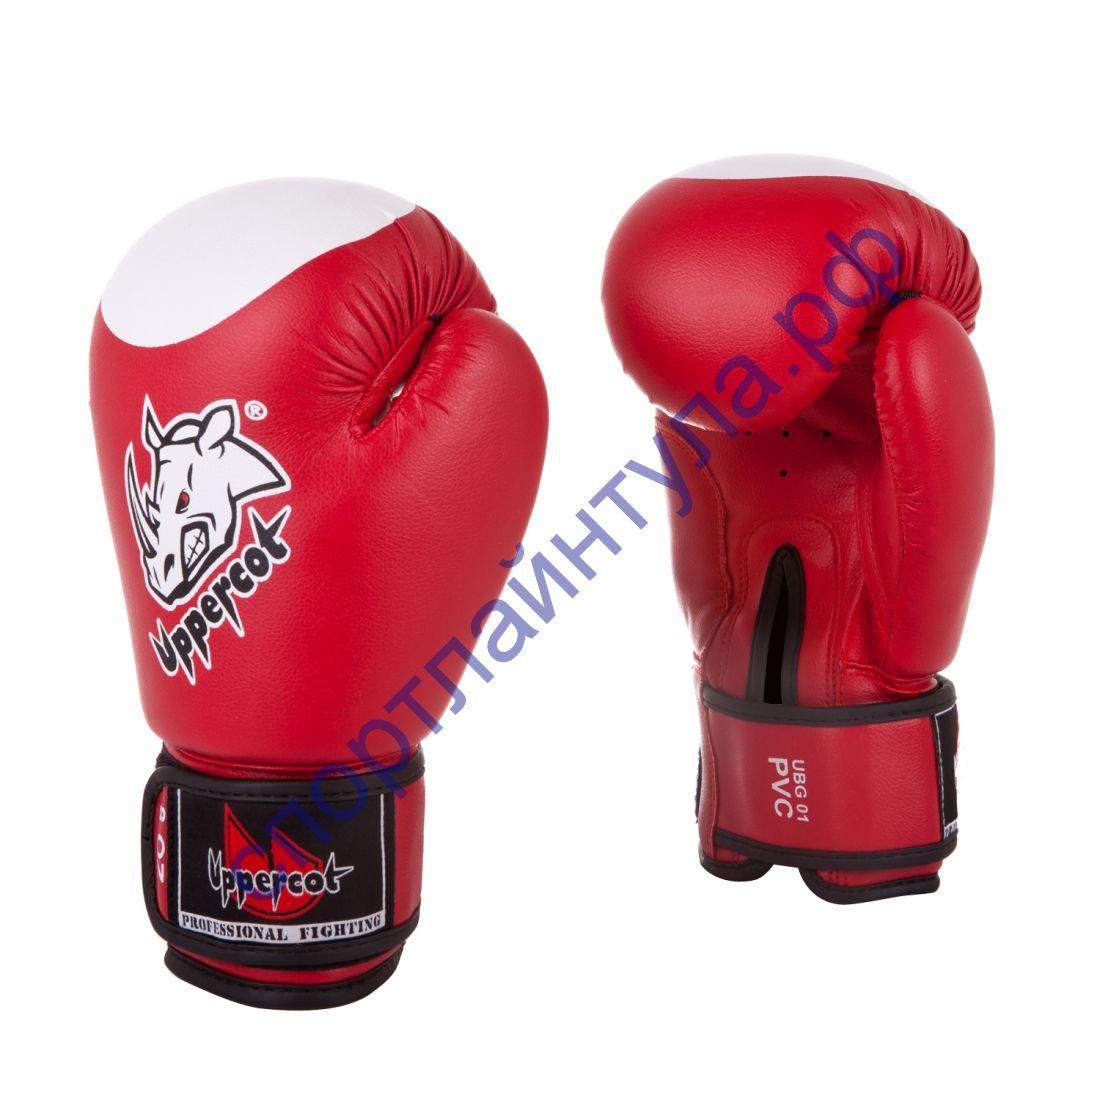 Боксерские перчатки UBG-01 PVC Red